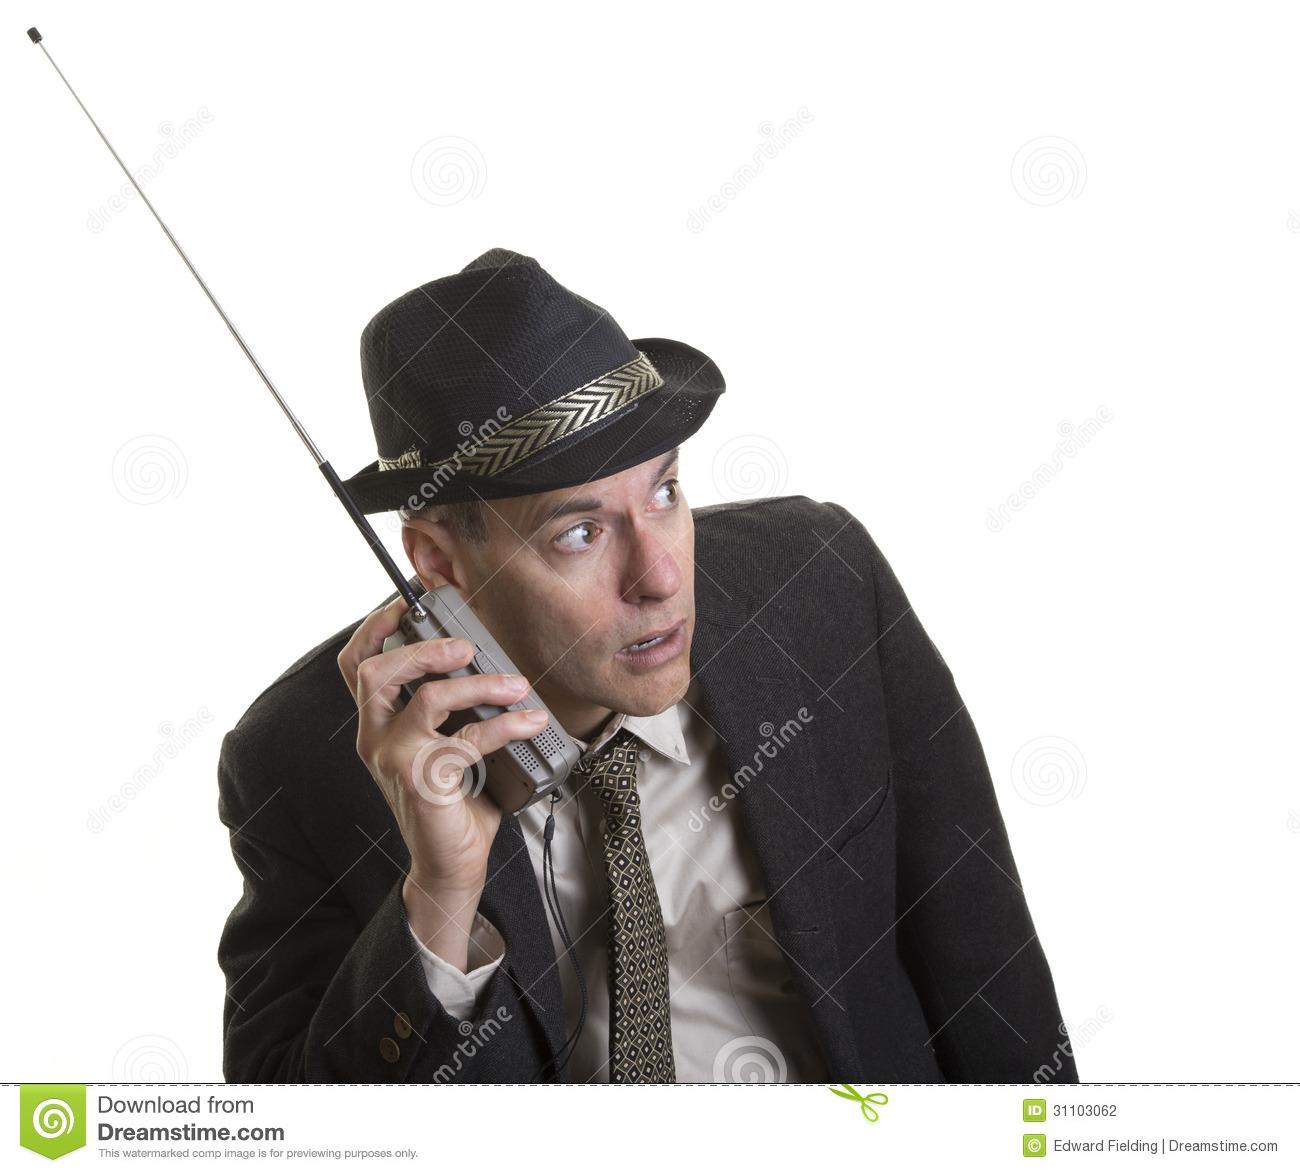 man-listening-intently-to-portable-radio-carefully-broadcast-news-sports-31103062.jpg